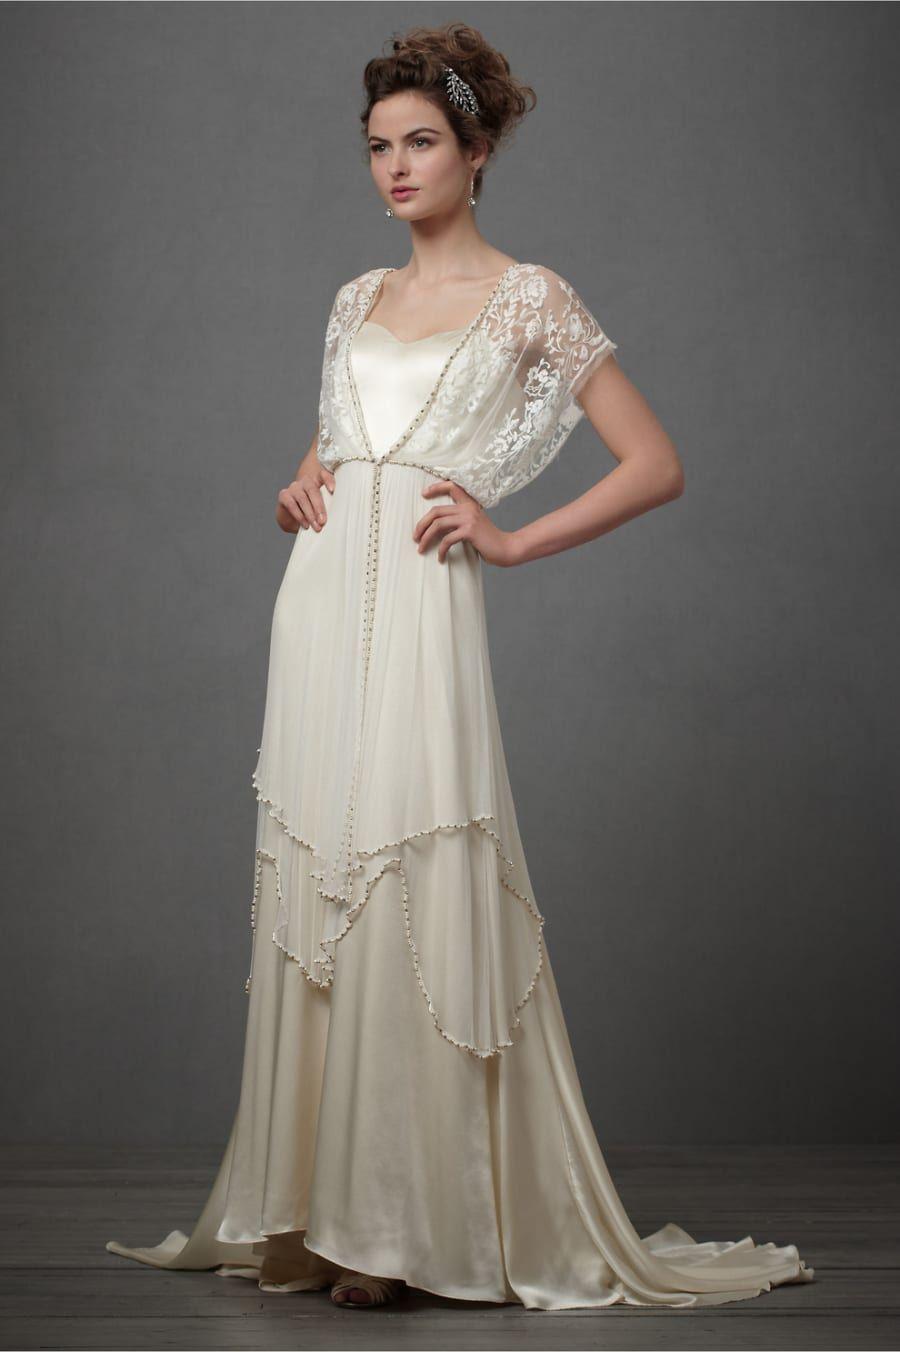 25 dazzling art deco wedding gowns art deco wedding gown